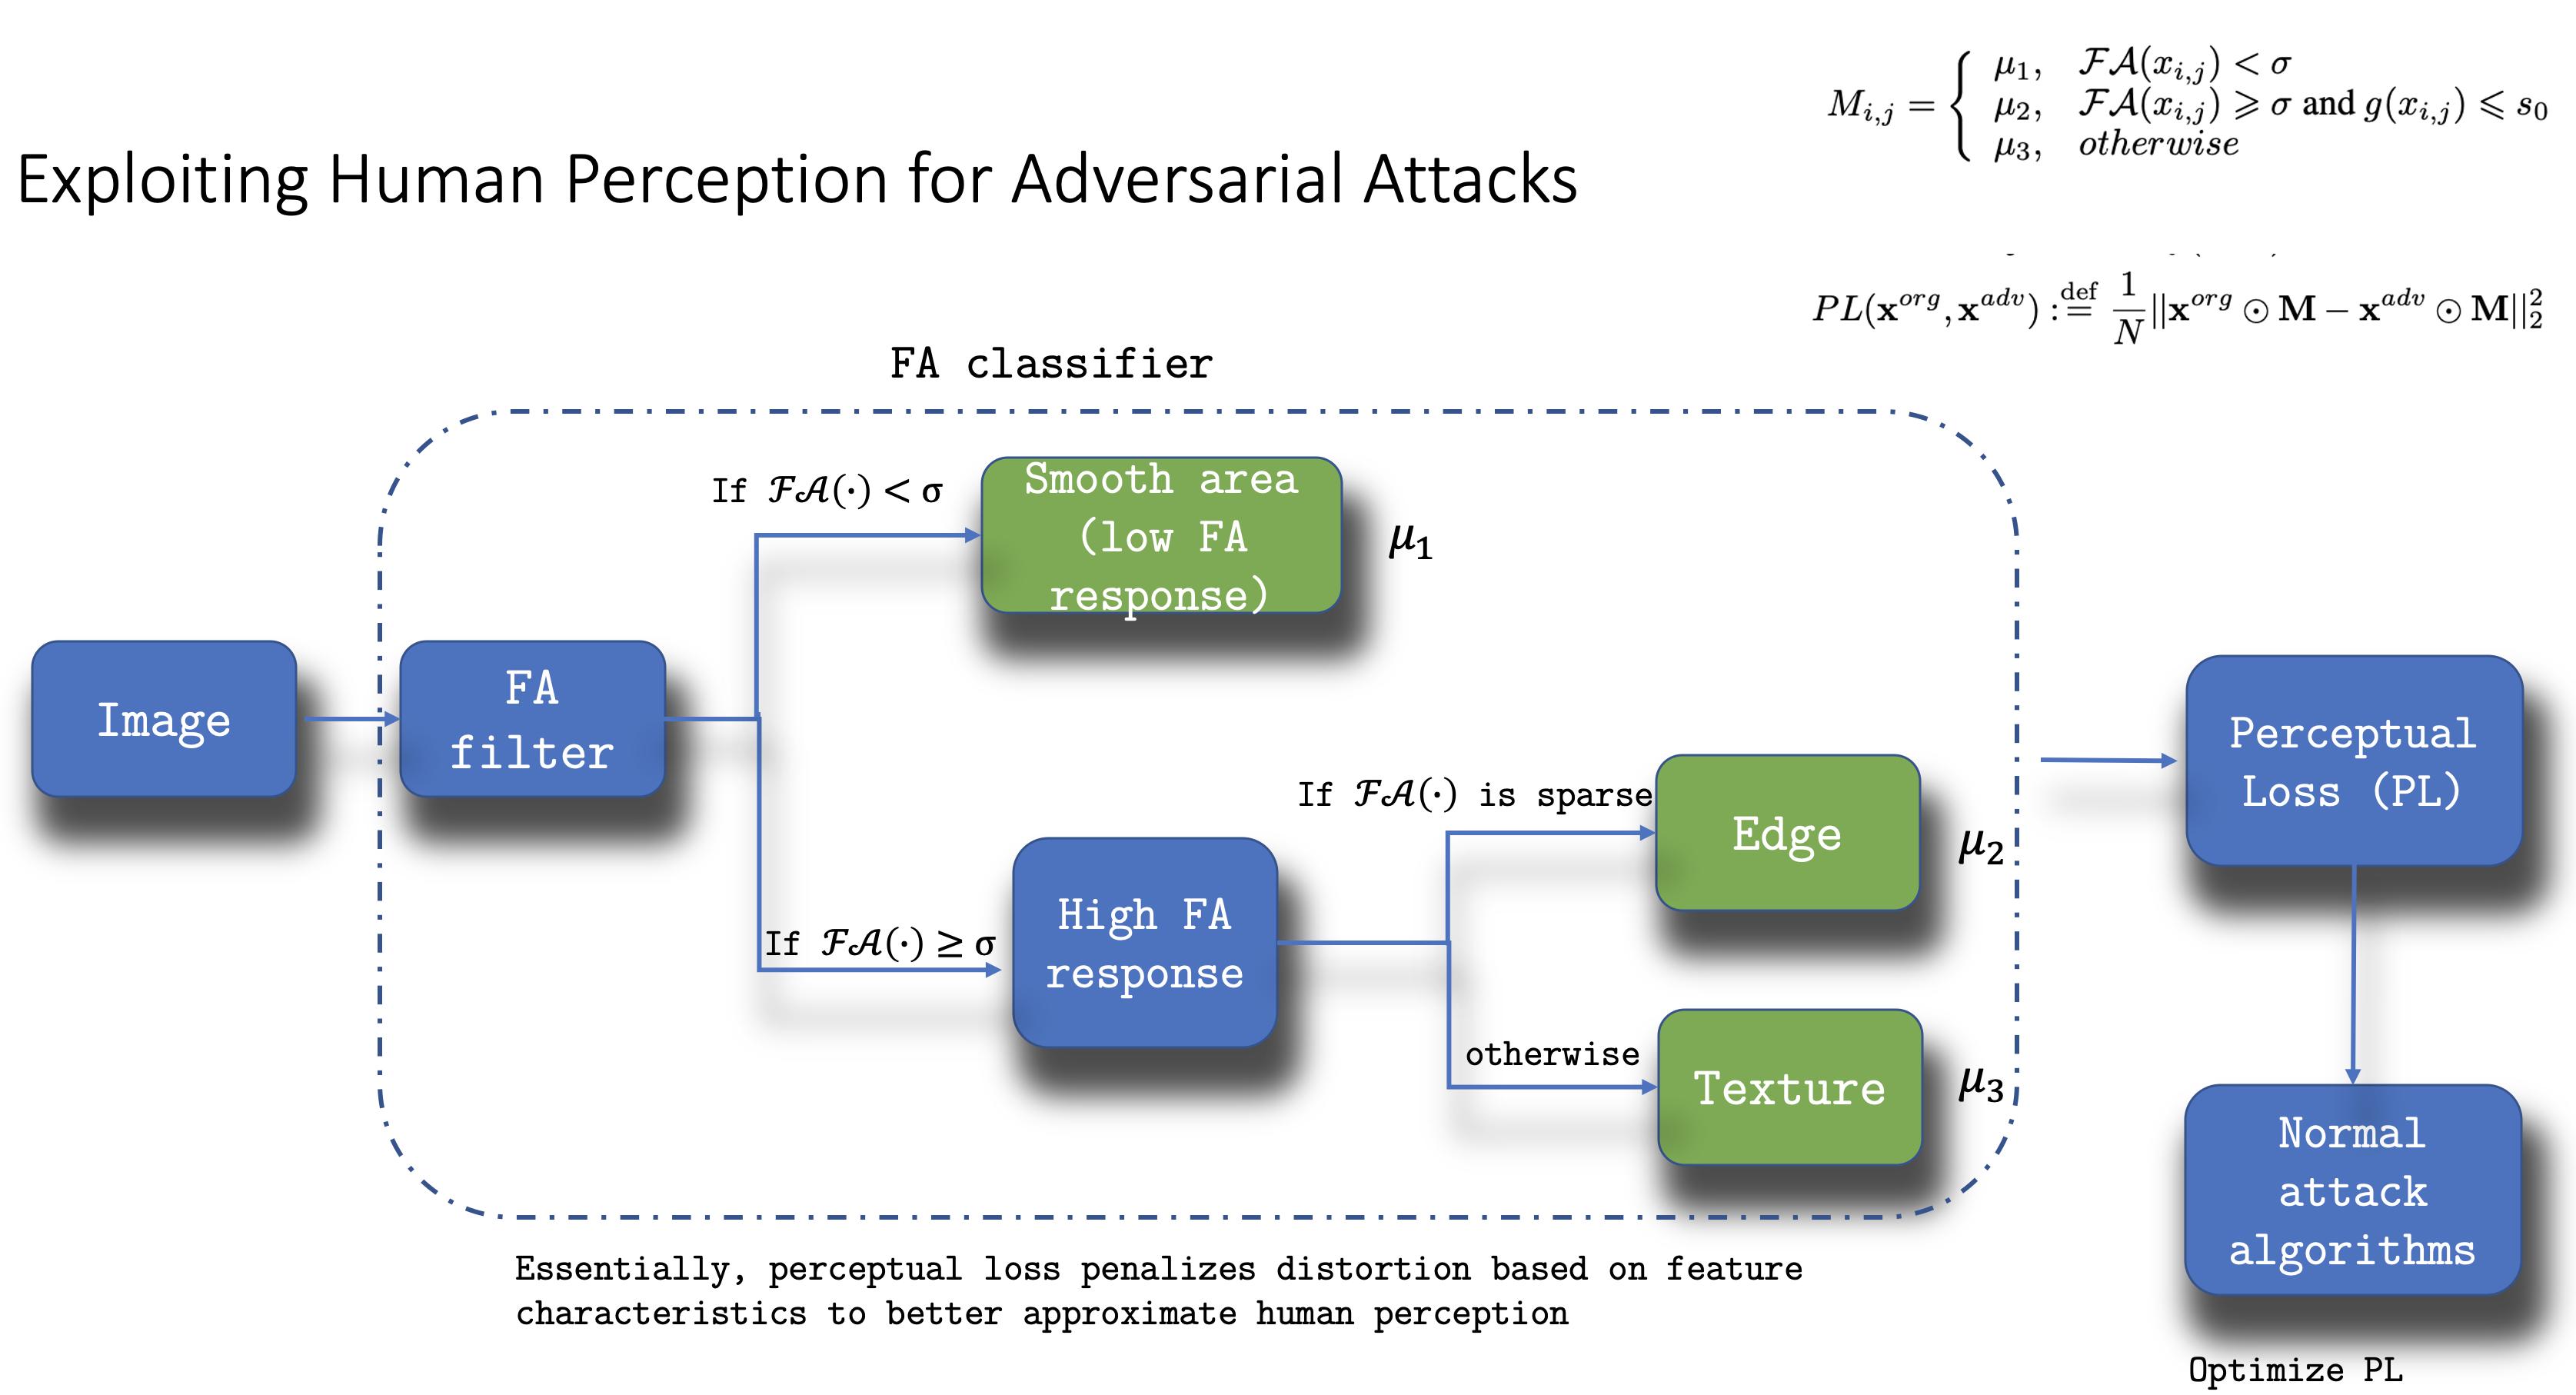 Exploiting Human Perception for Adversarial Attacks